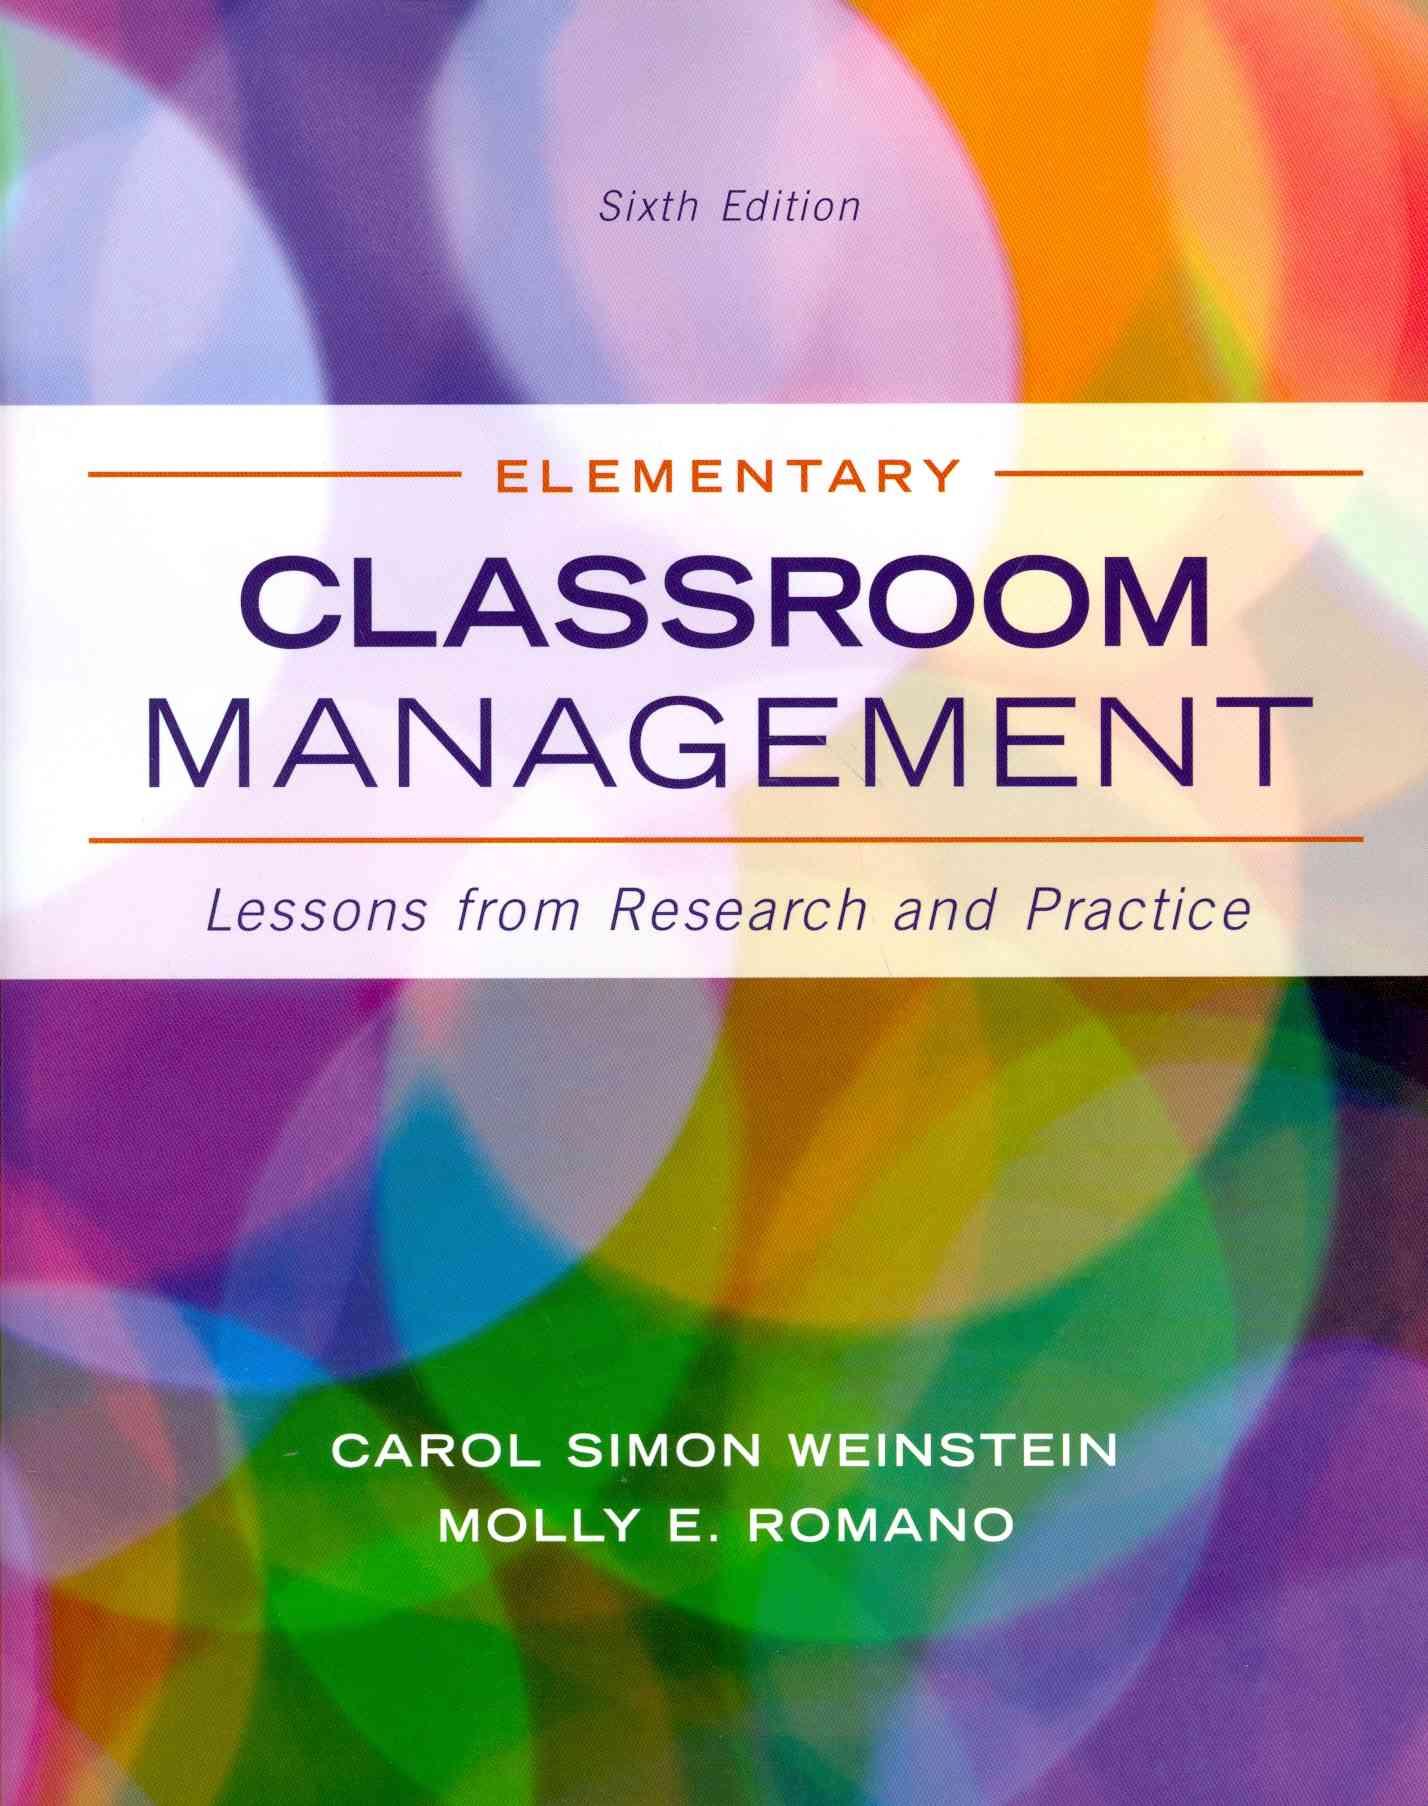 Elementary Classroom Management By Weinstein, Carol Simon/ Romano, Molly/ Mignano Jr., Andrew J.